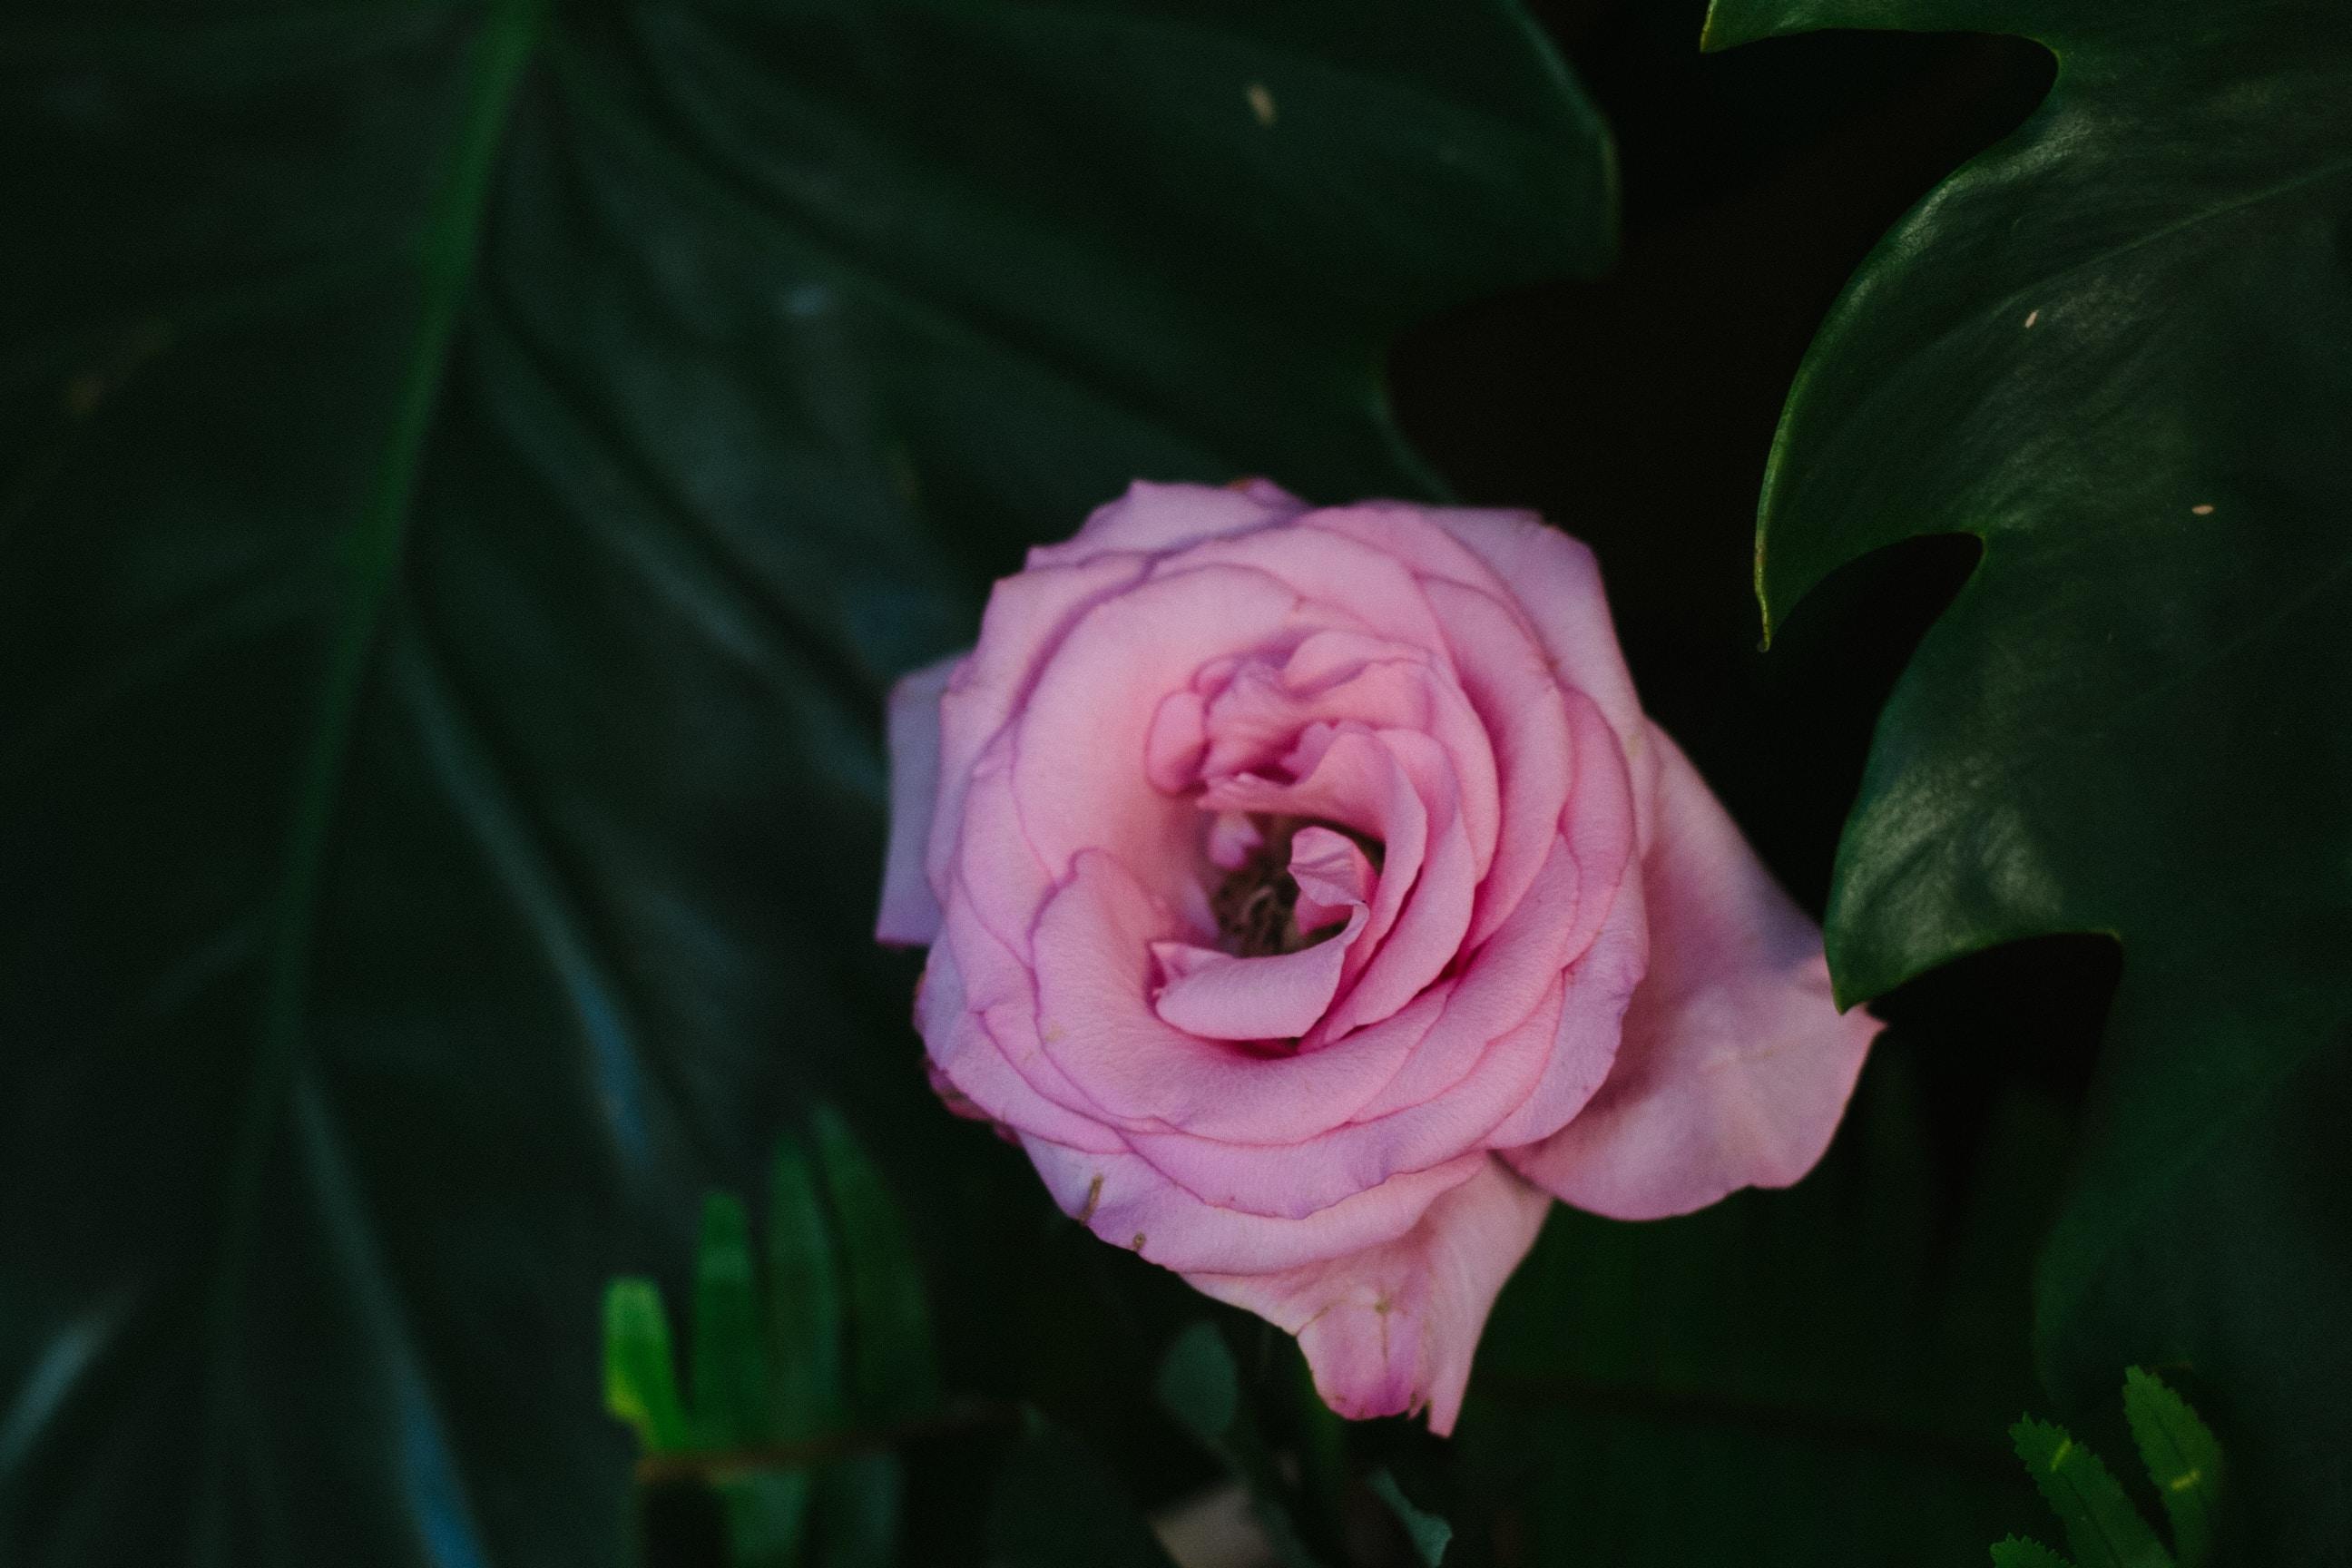 pink multi-petaled flower